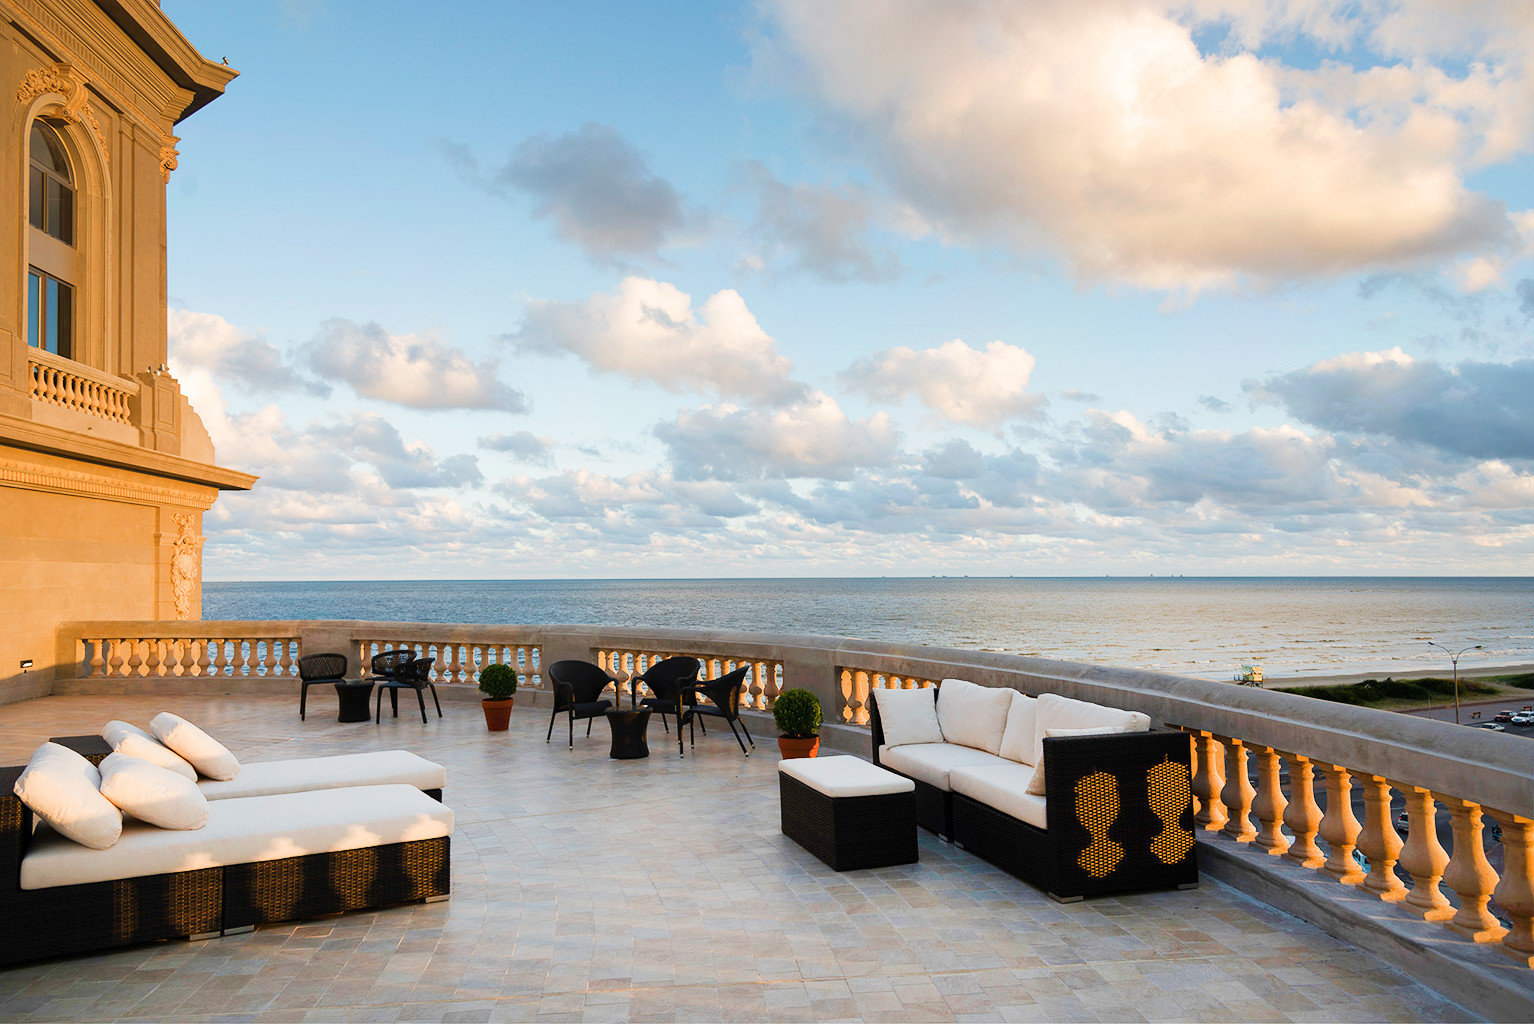 Balcony Beachfront Drink Luxury Resort Rooftop Scenic views Wine-Tasting sky Sea Ocean Coast Beach